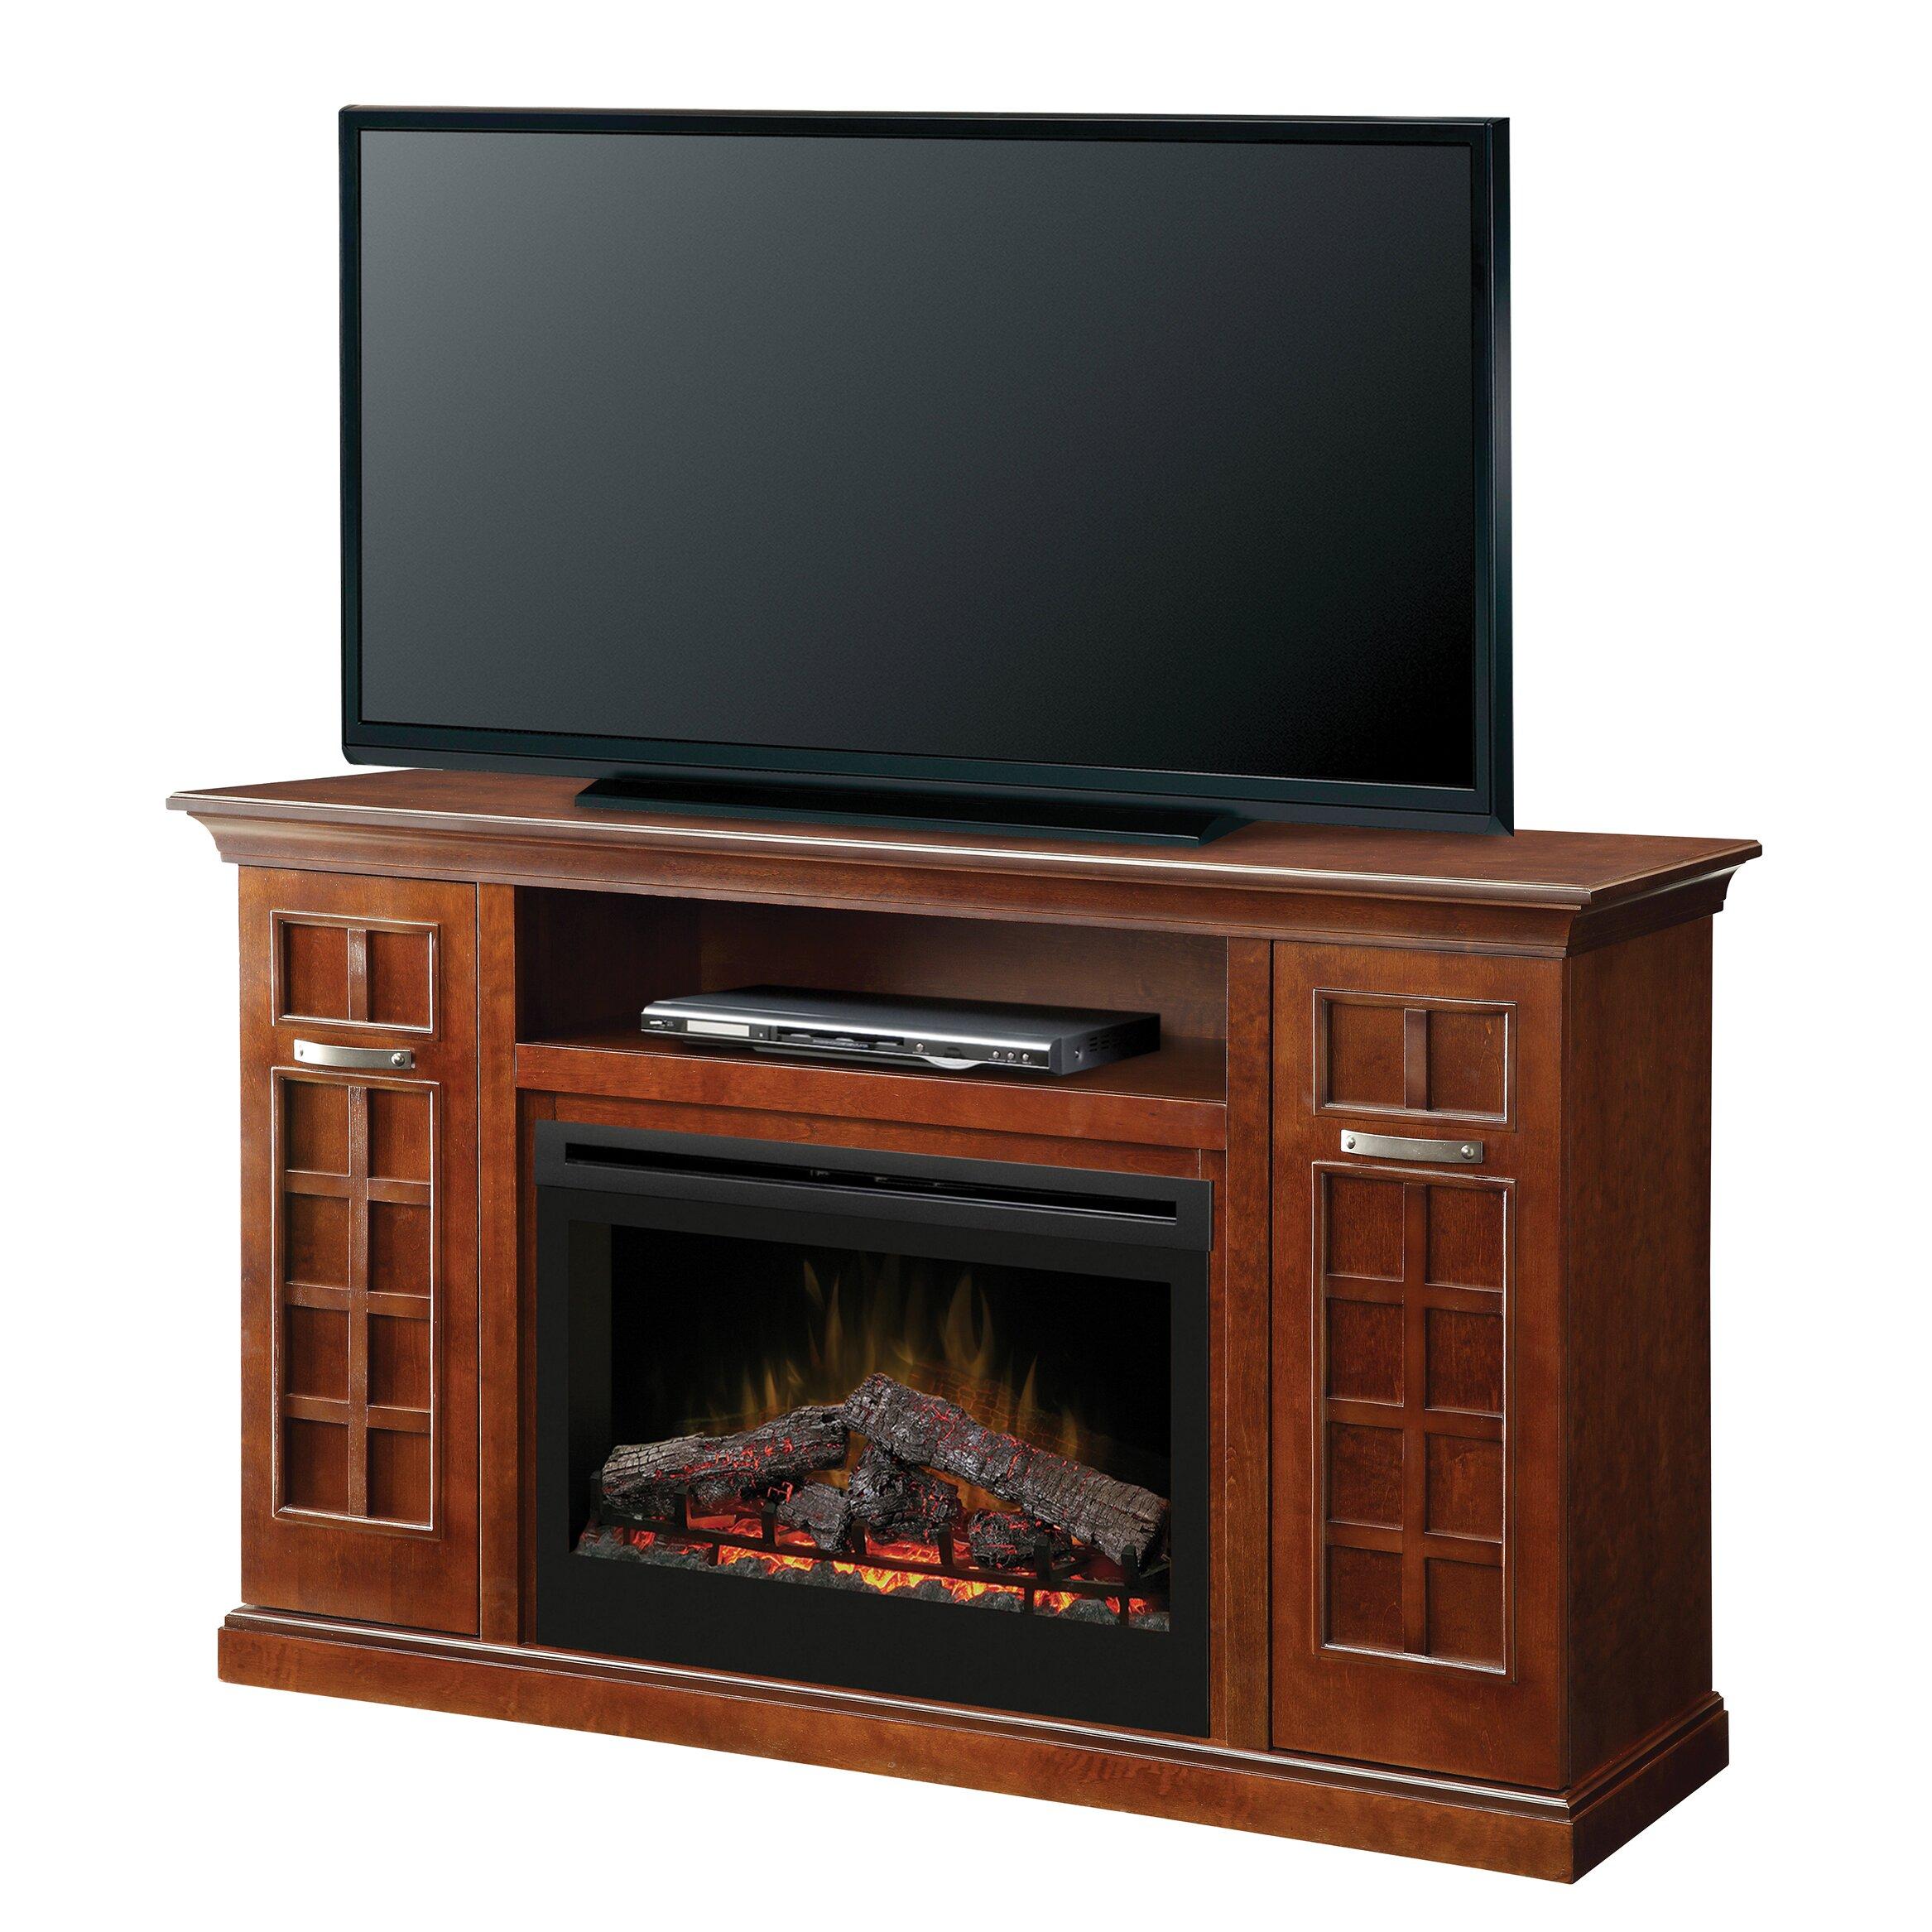 Dimplex Yardley Media Console Electric Fireplace Reviews Wayfair